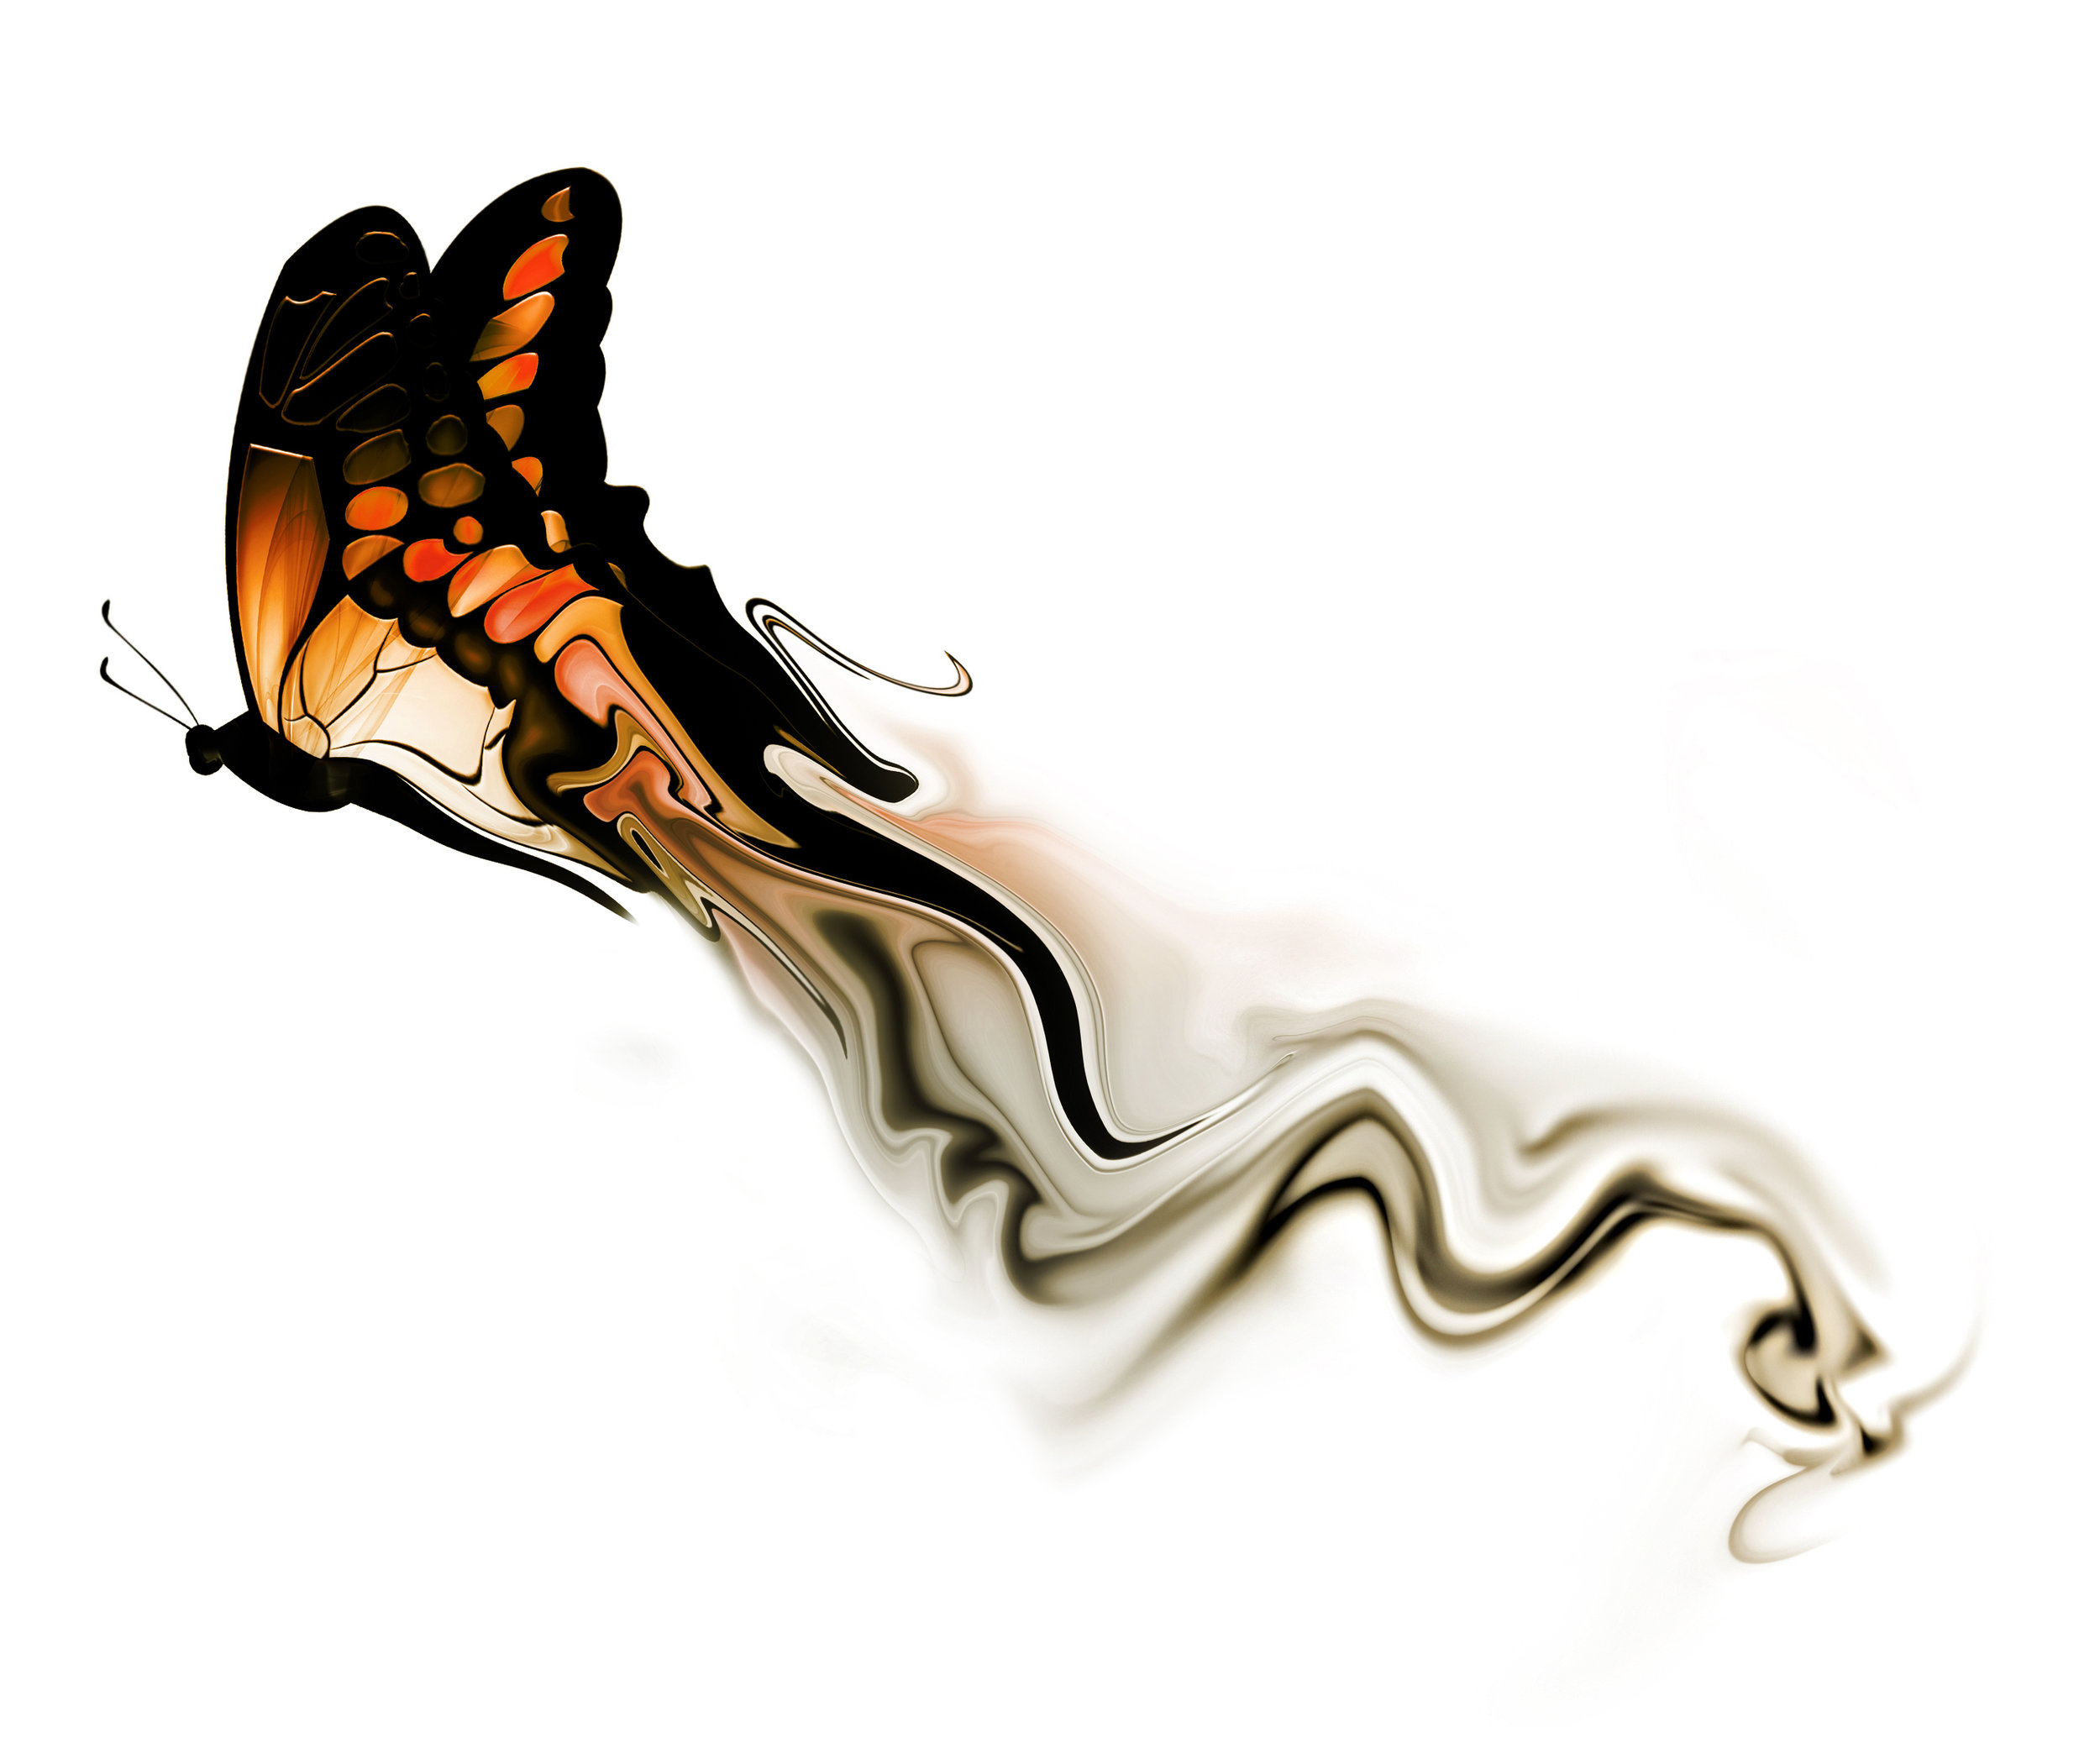 Image by Shutterstock Cool Heart Made Of Butterflies Women/'s Tee